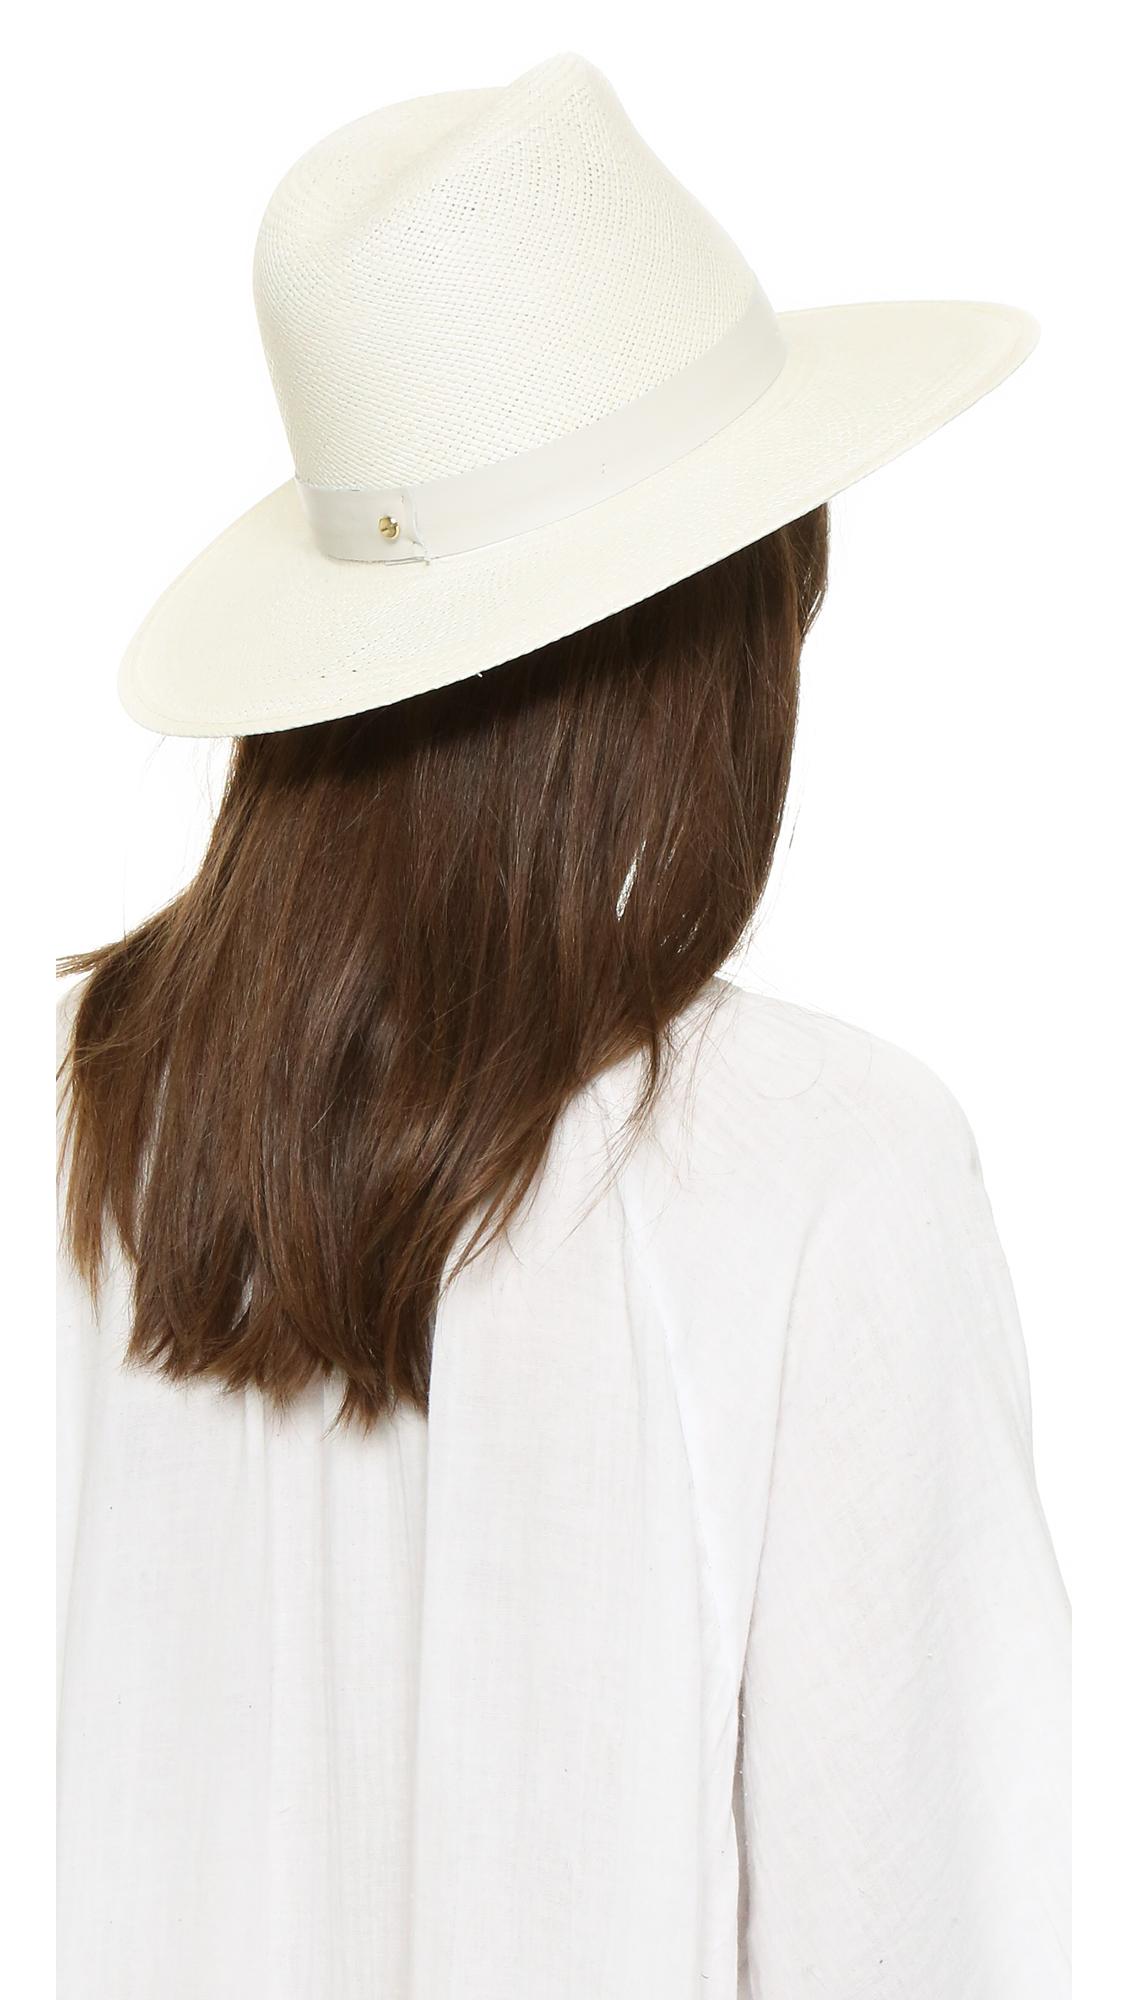 Janessa Leone Aisley Short Brimmed Panama Hat  aea27af1768